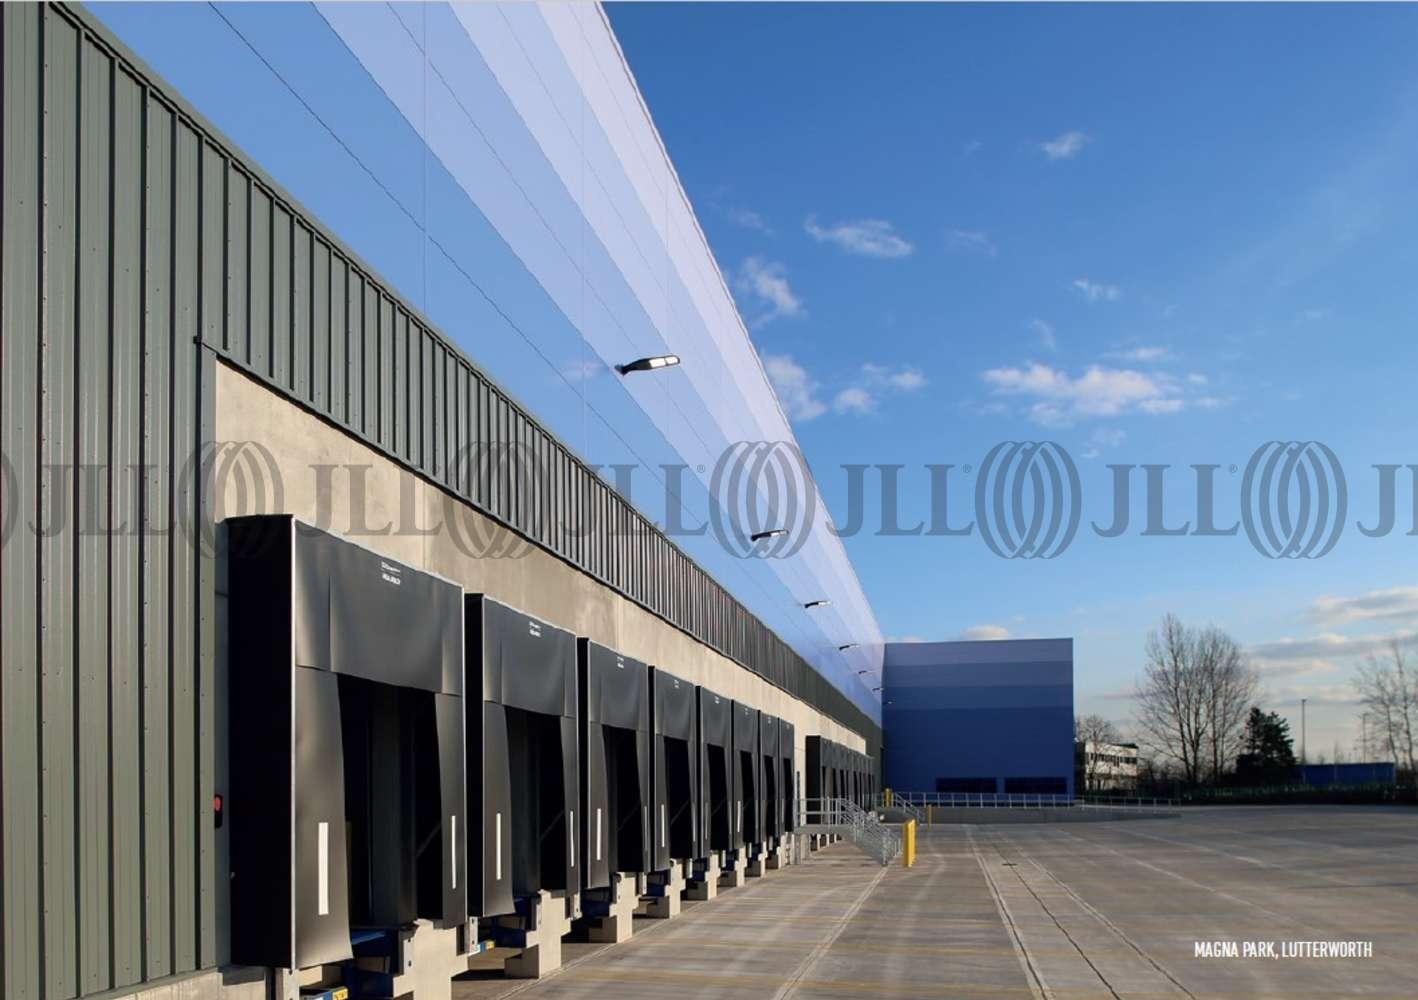 Industrial Lutterworth, LE17 4XT - Hurricane 258, Magna Park